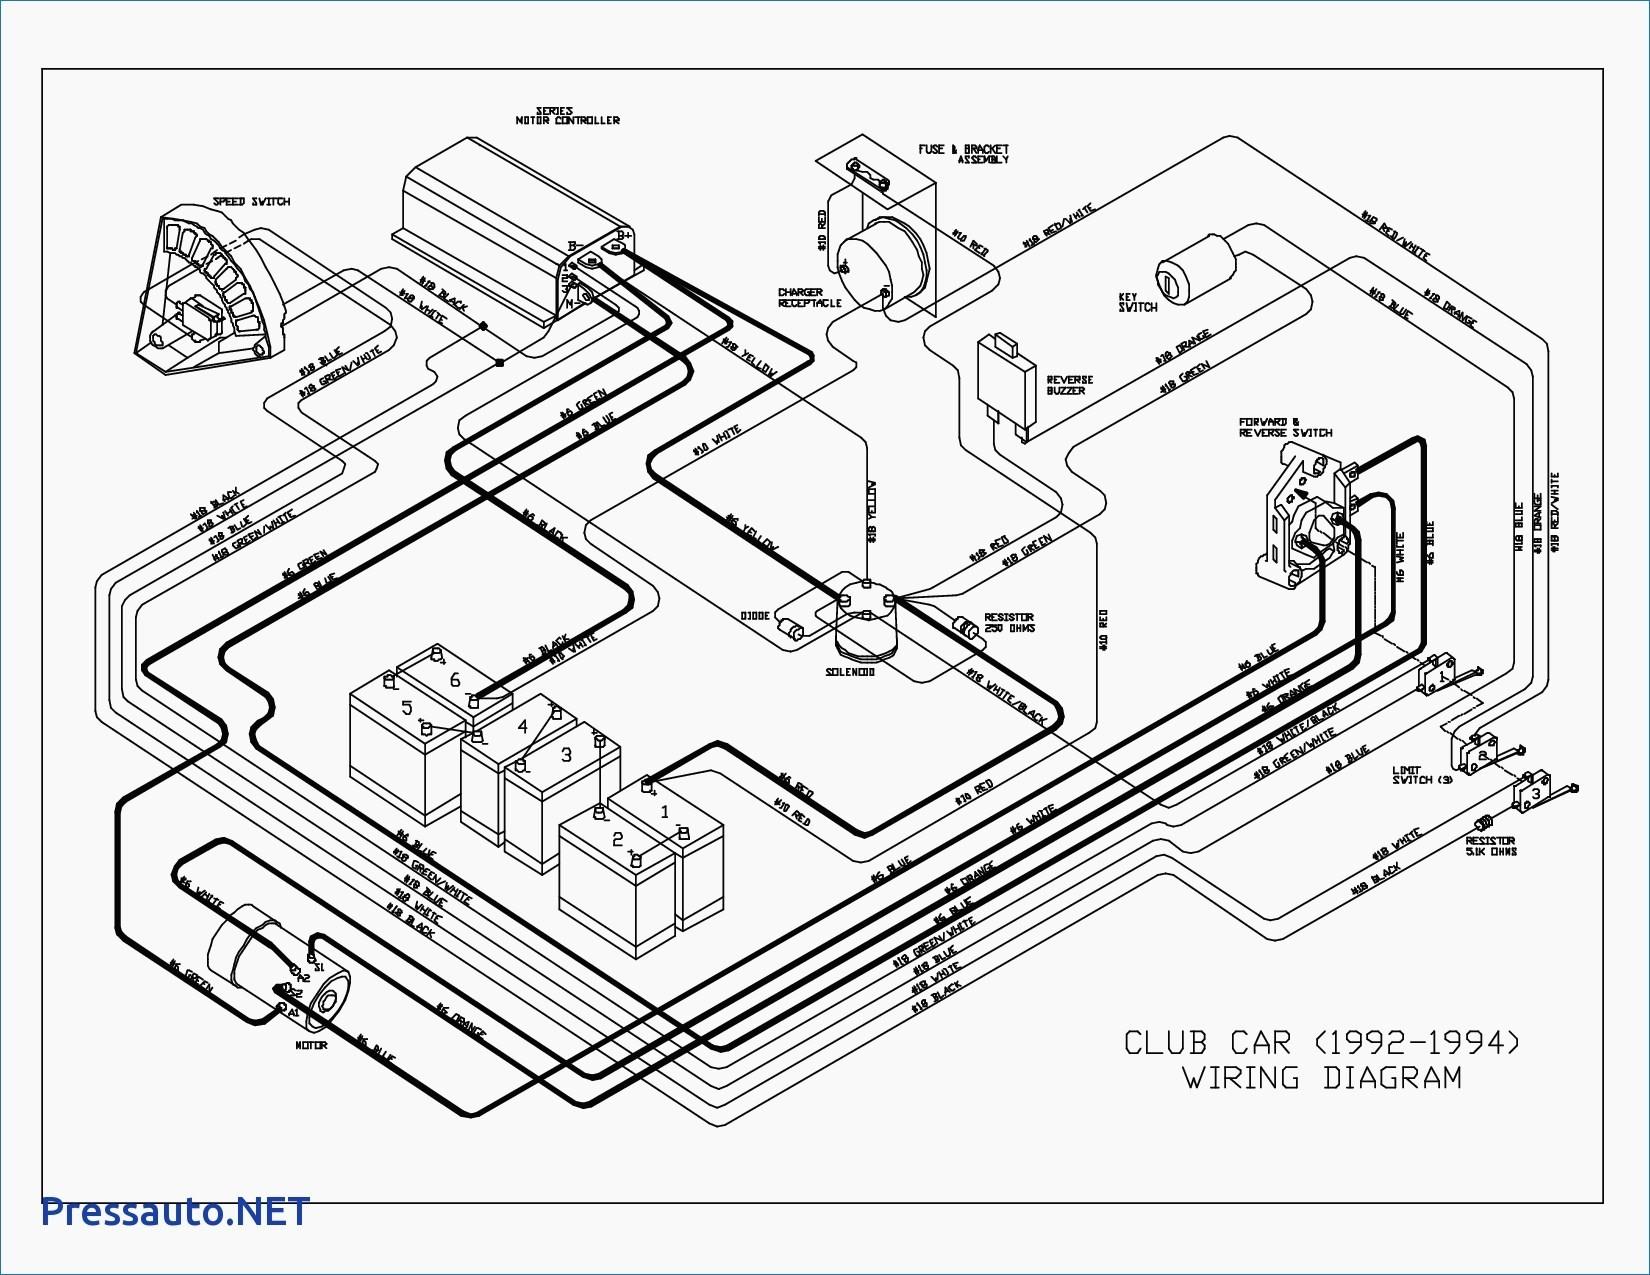 hight resolution of club car electric golf cart wiring diagram wiring diagram club car 48 volt with golf cart